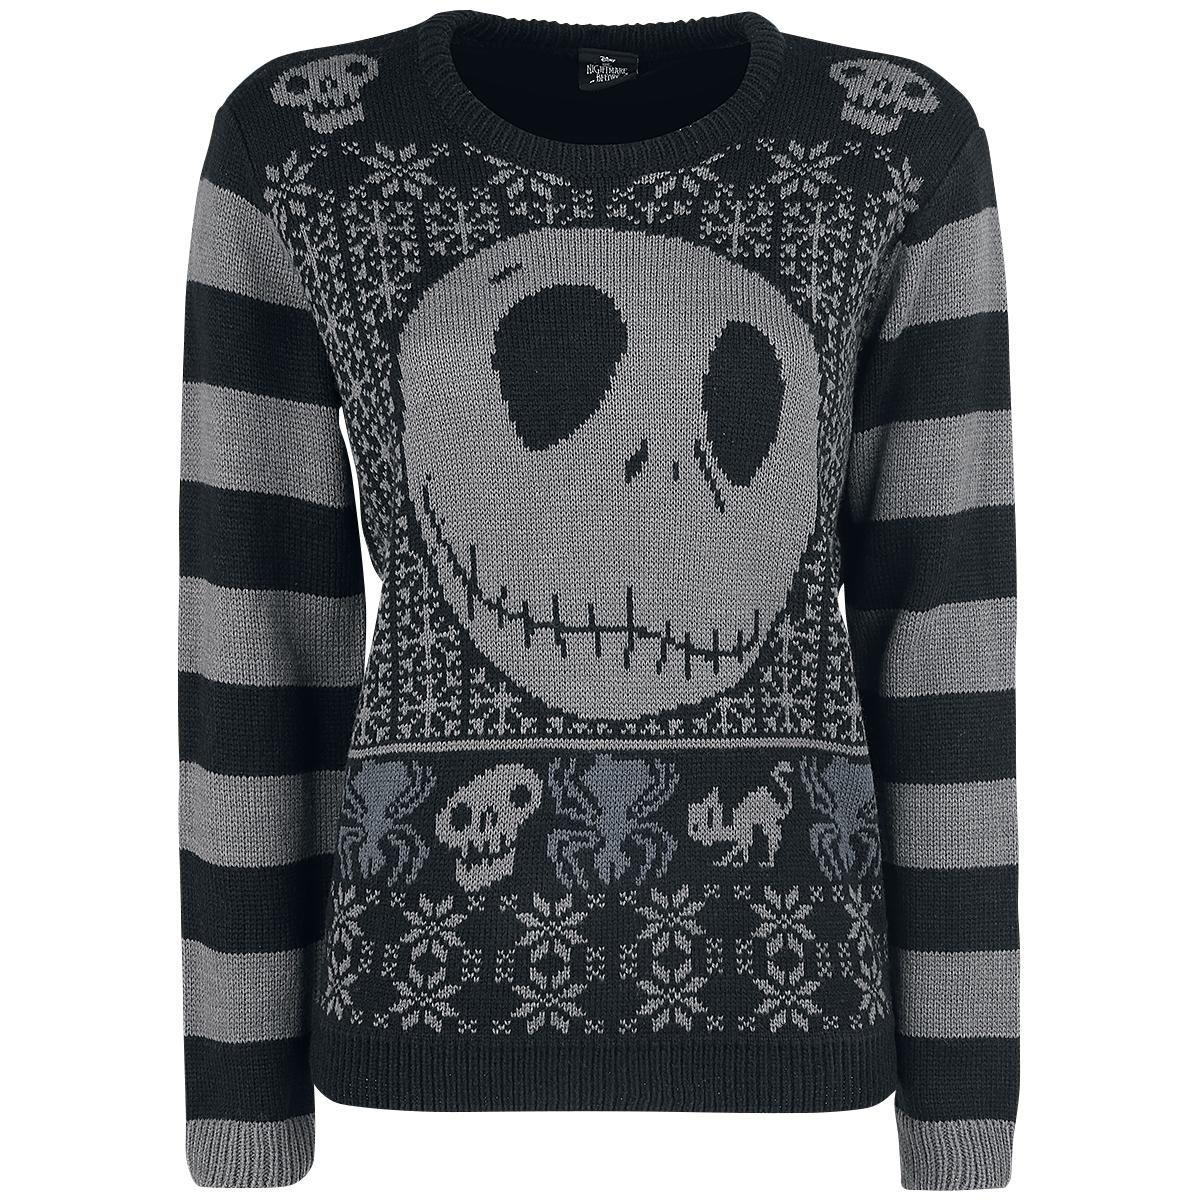 Jack Skelington Christmas Sweater - Christmas jumper by The ...